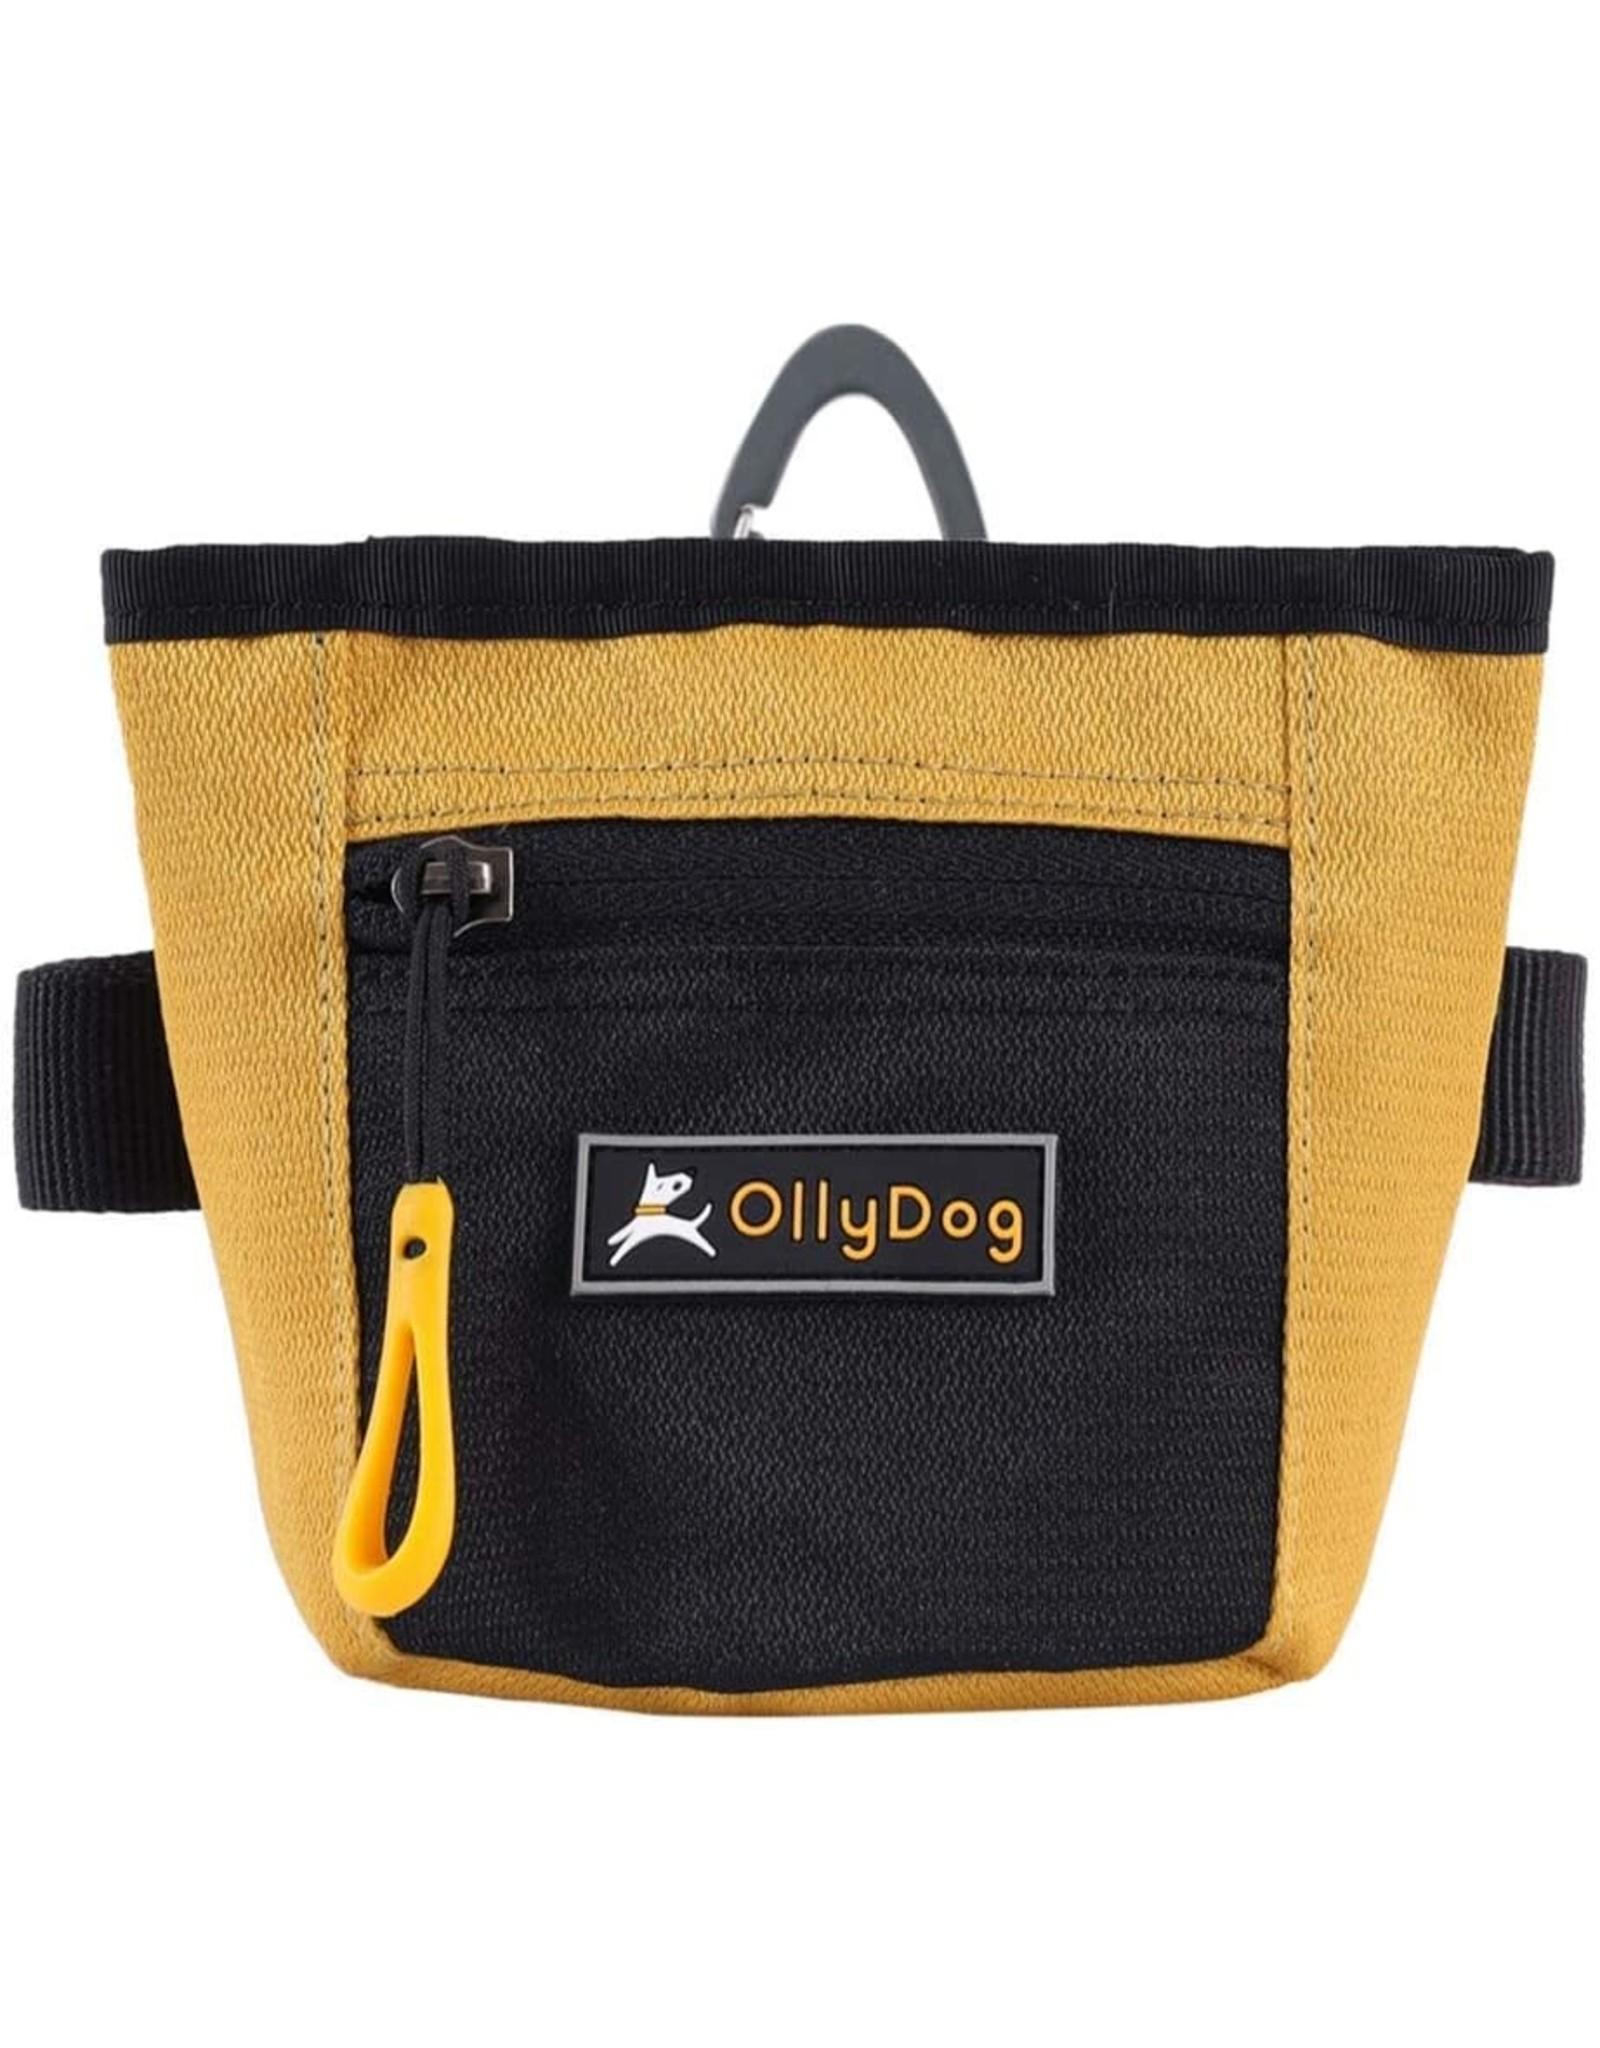 OllyDog Goodie Treat Bag: Golden Spice, os